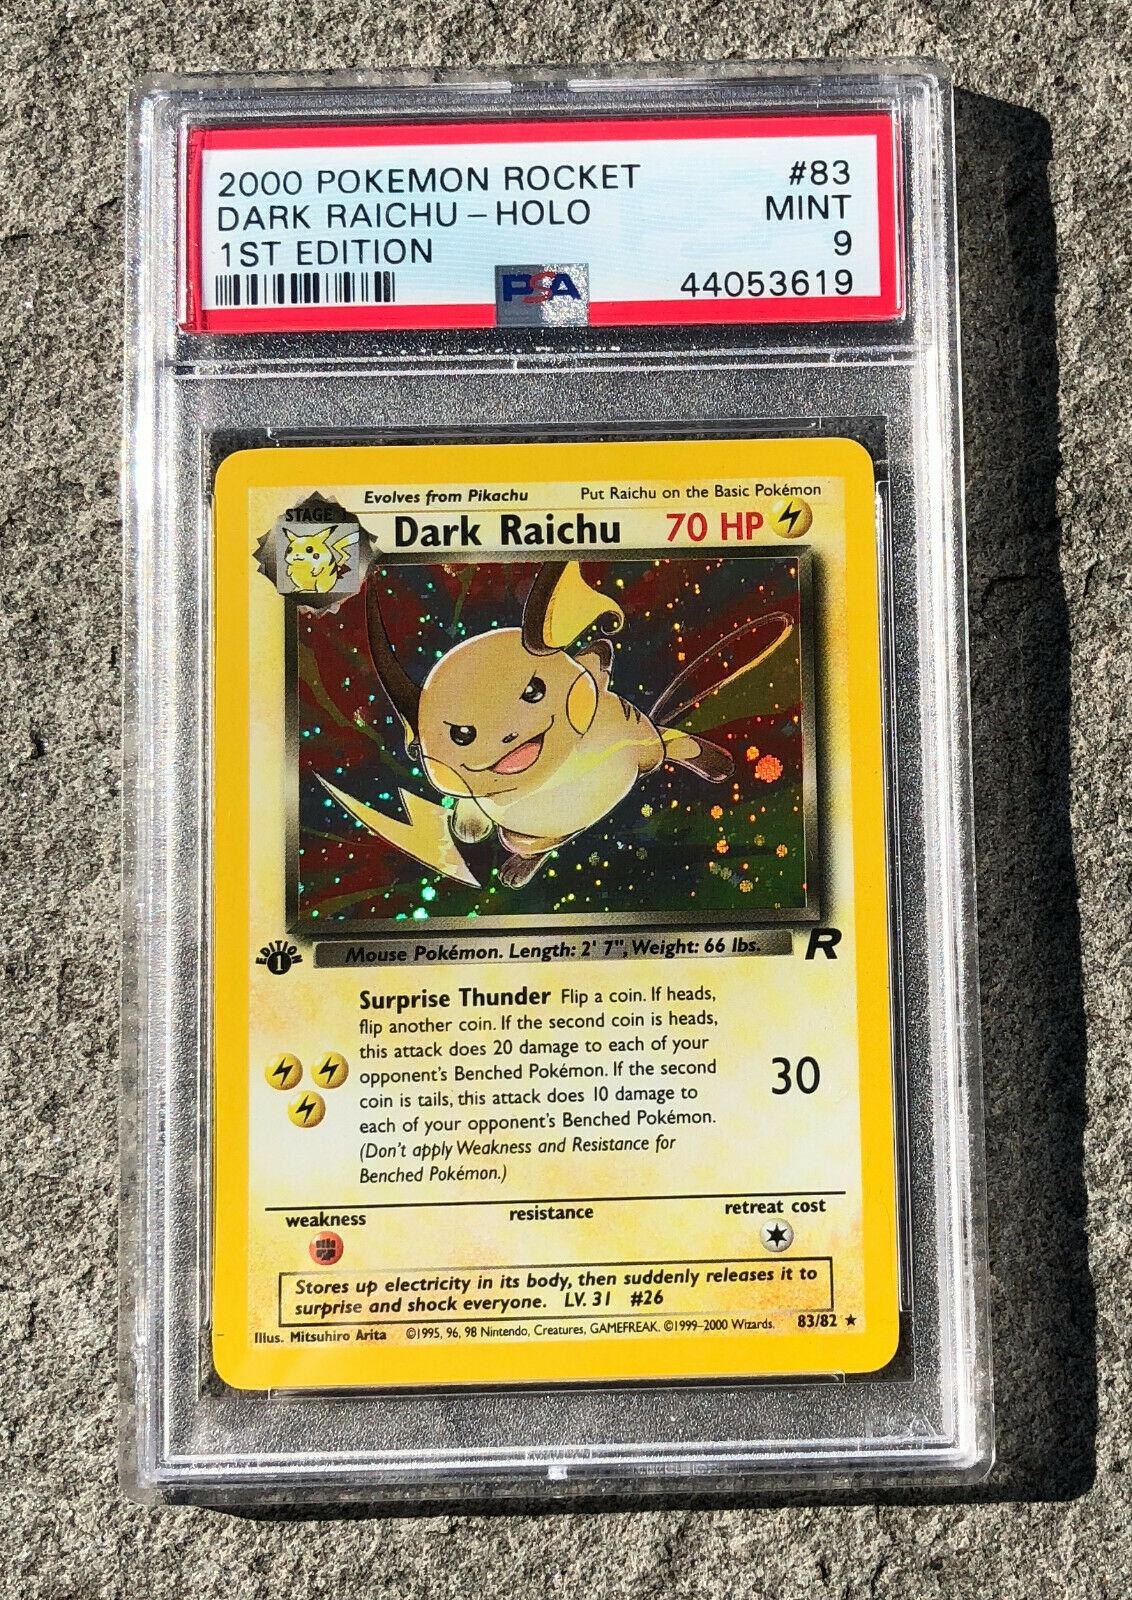 Pokemon Card  PSA 9 MINT 1st Edition Holo Dark Raichu Rocket 2000